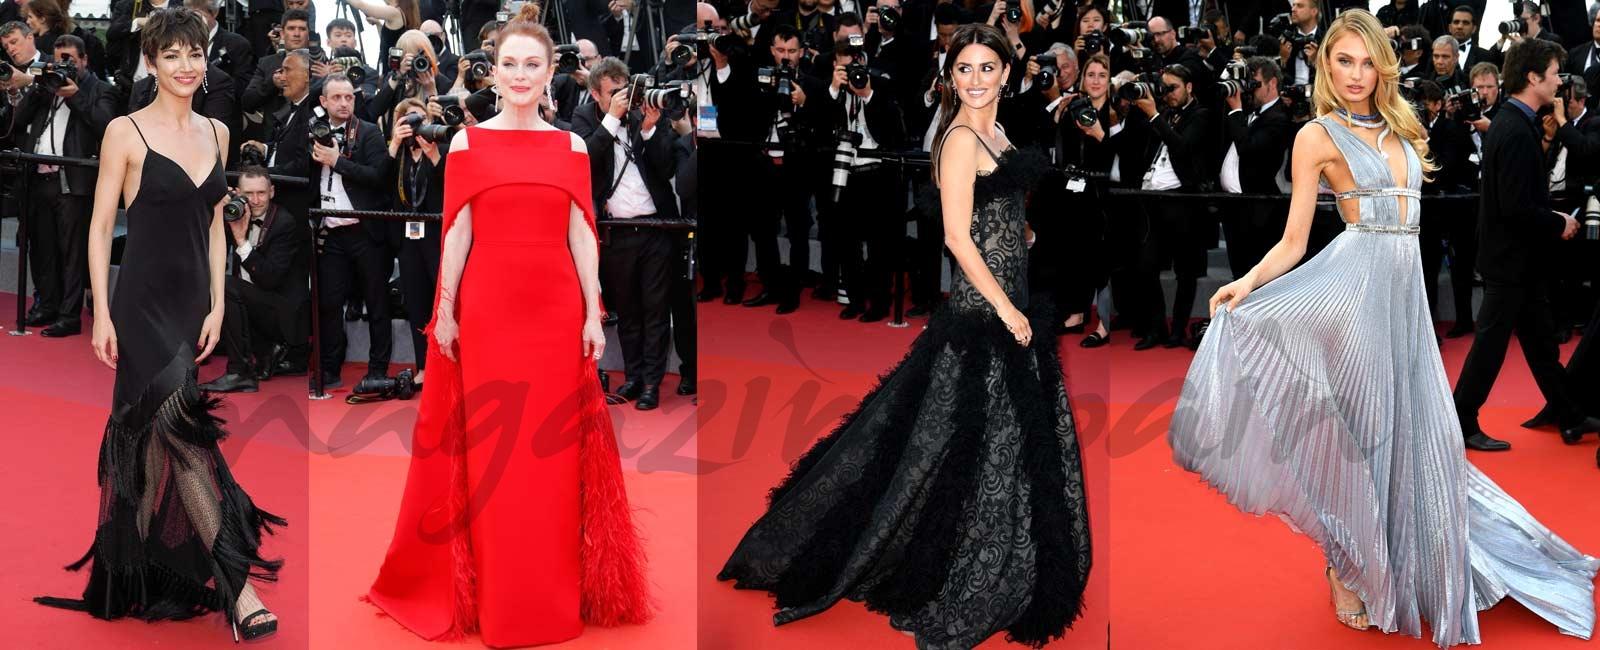 Los mejores looks de la primera alfombra roja de la 71º del Festival de Cine de Cannes